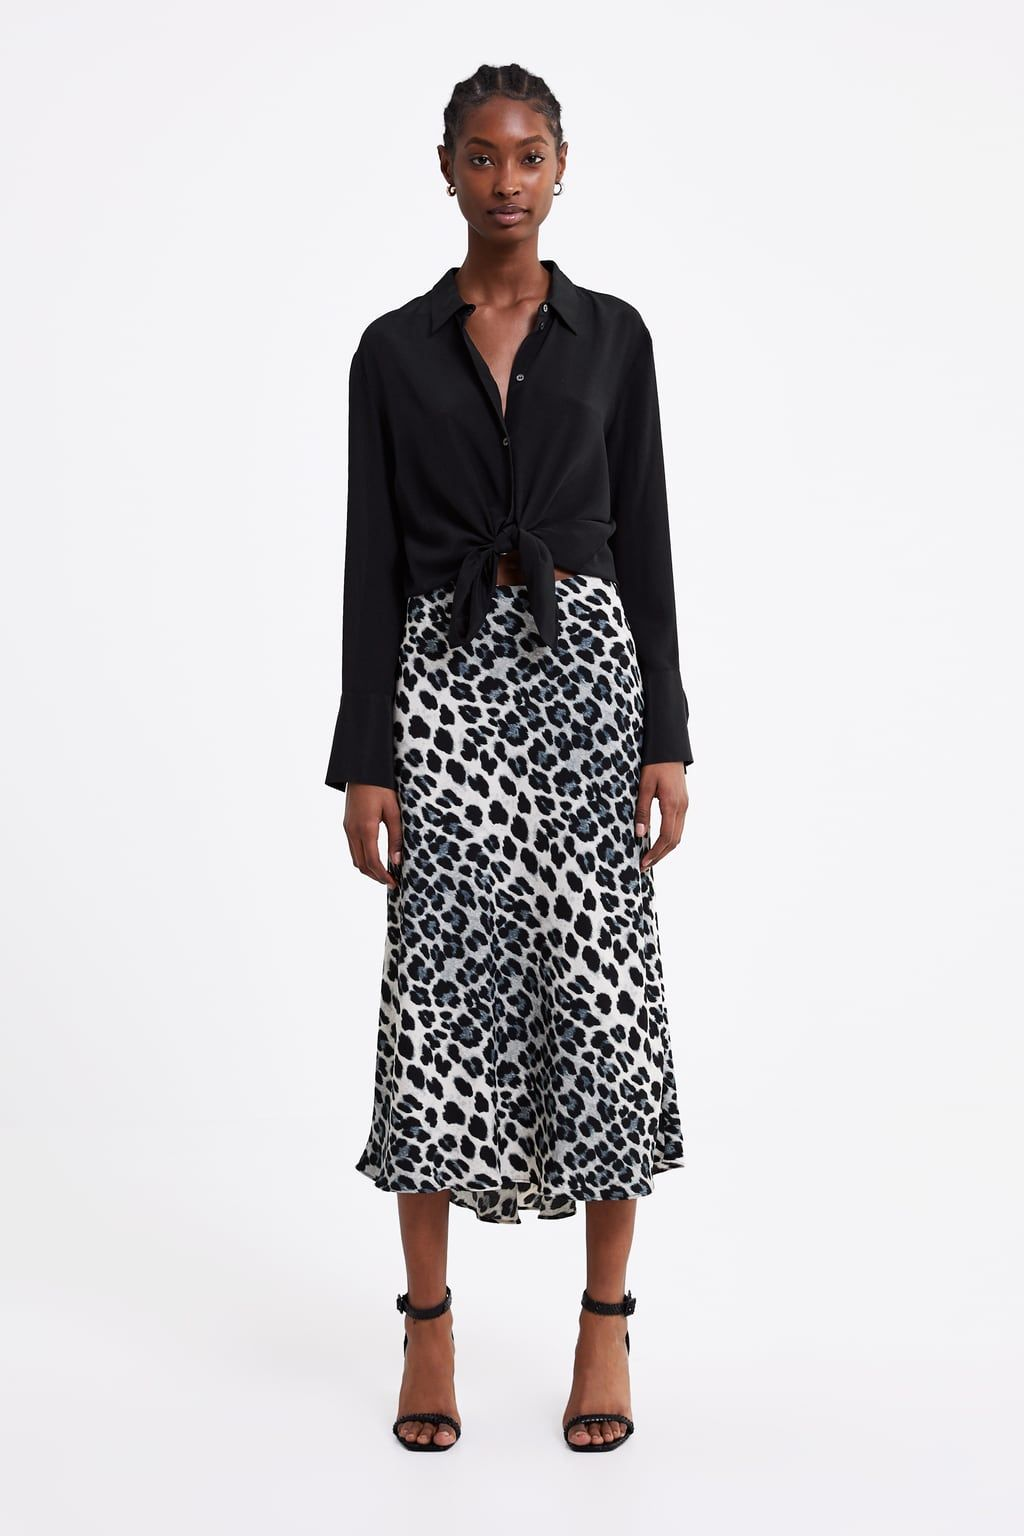 53256ec7e45a4 Animal print skirt in 2019 | Fashion - Skirts | Animal print skirt ...